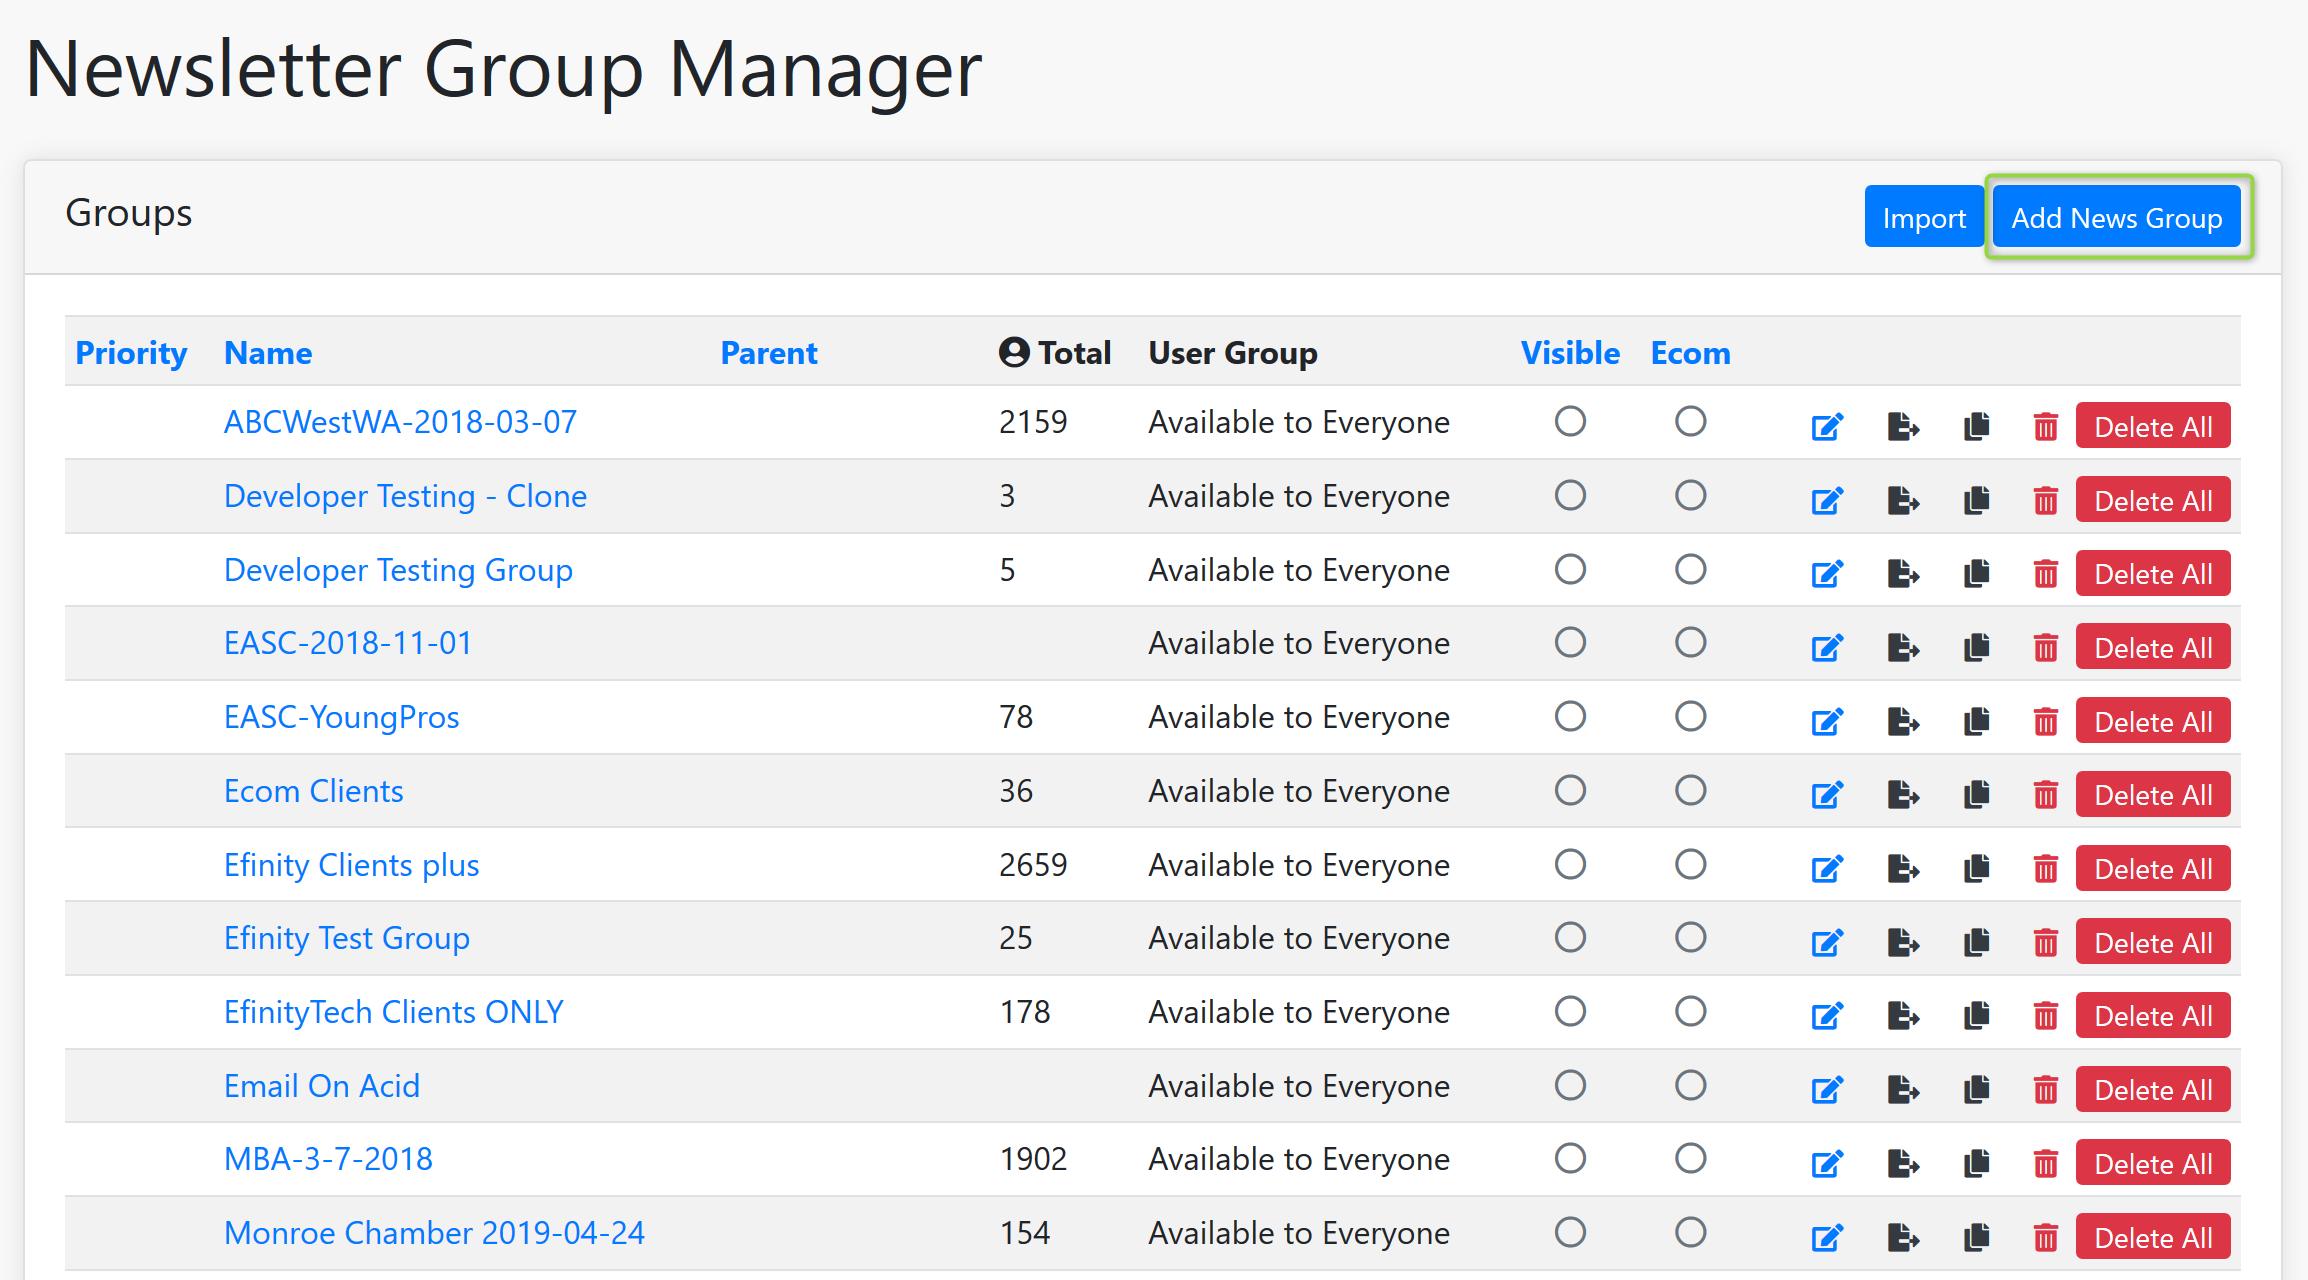 Newsletter Group Manager Screenshot